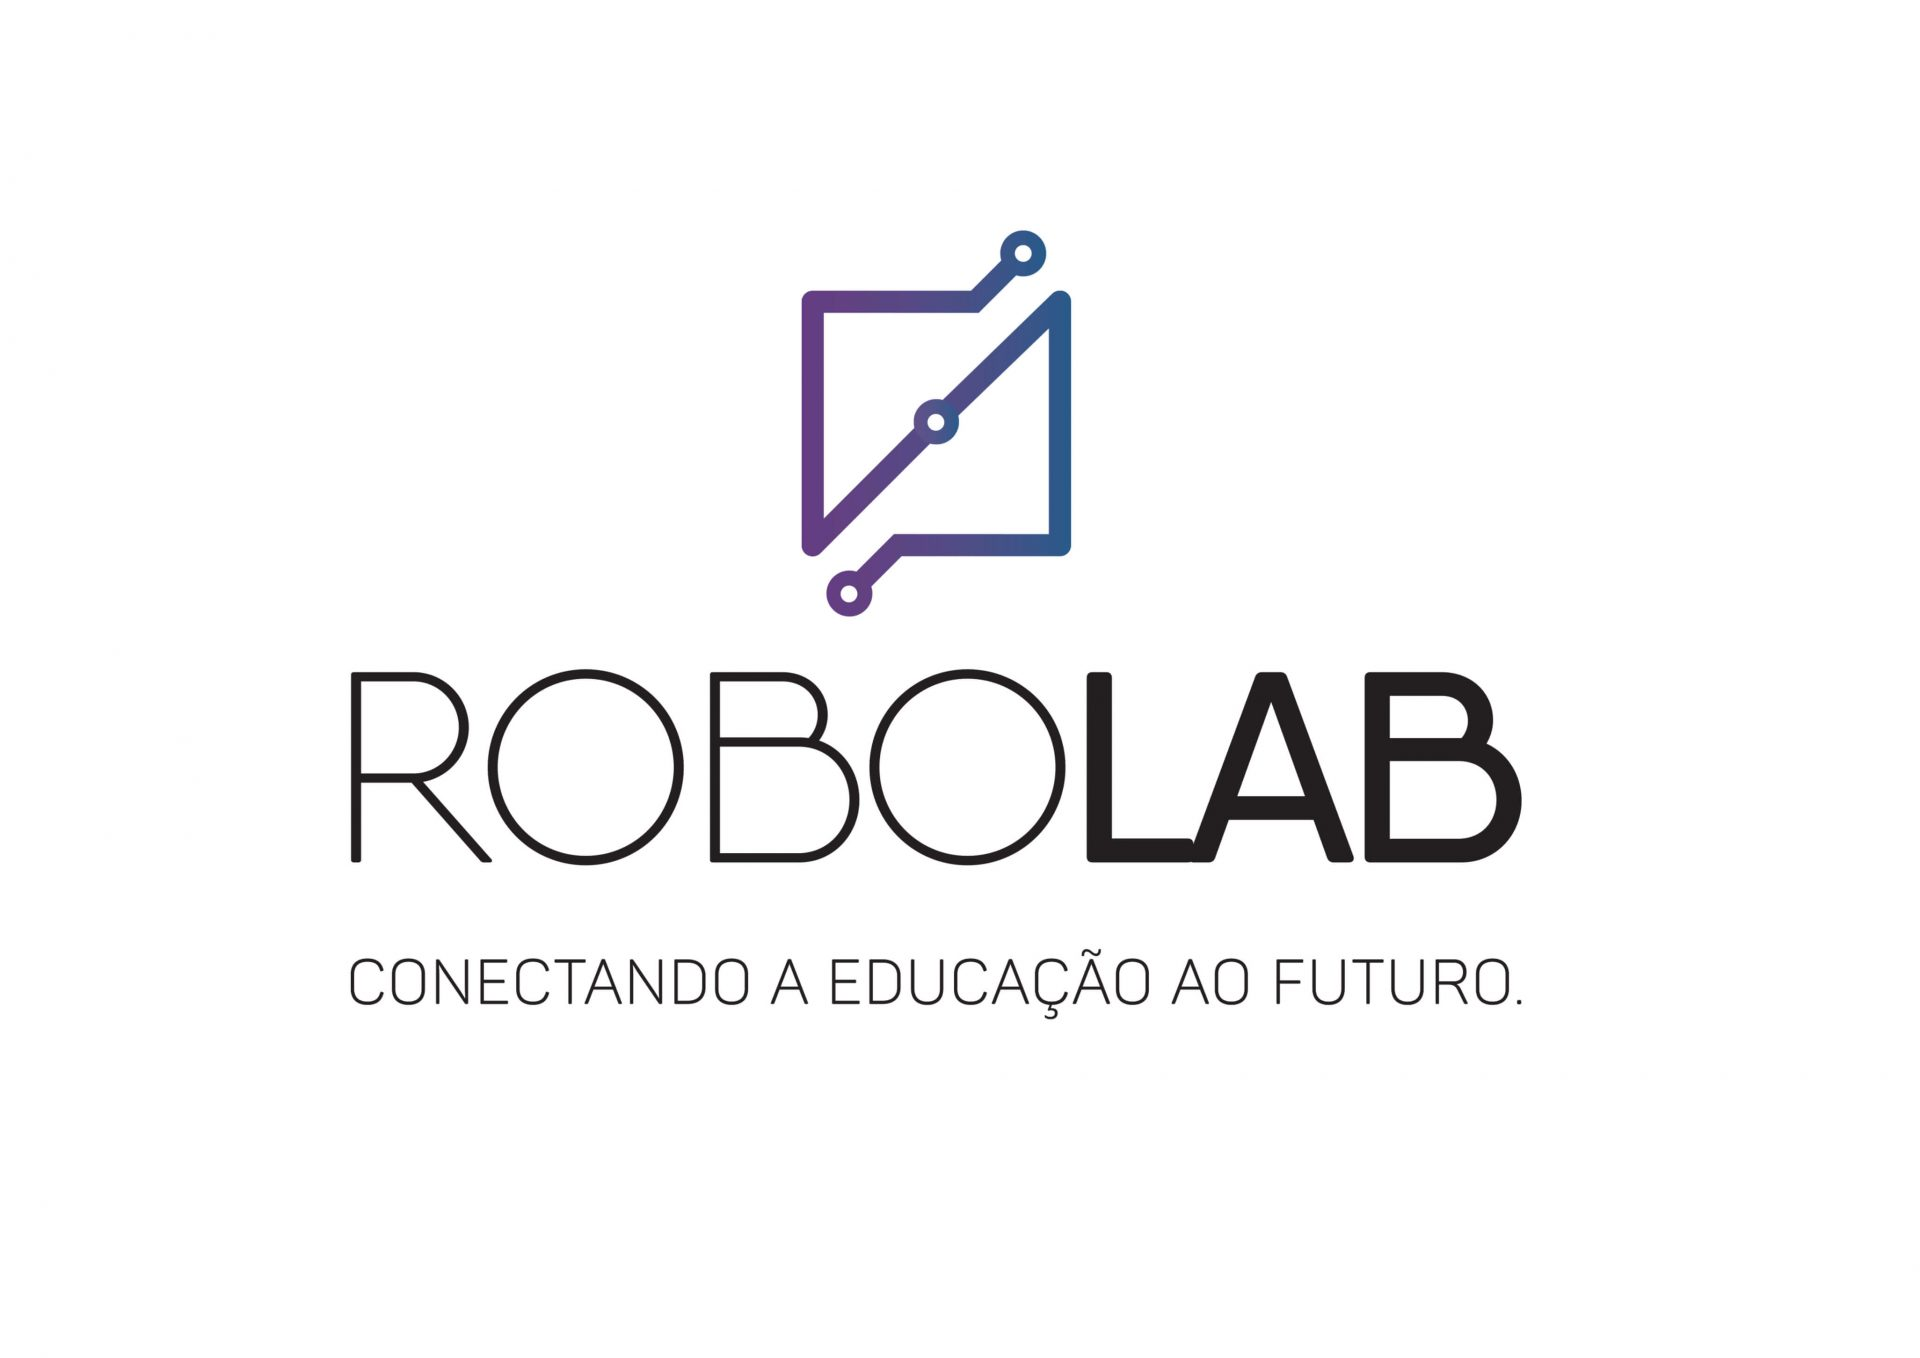 Robolab logo 1